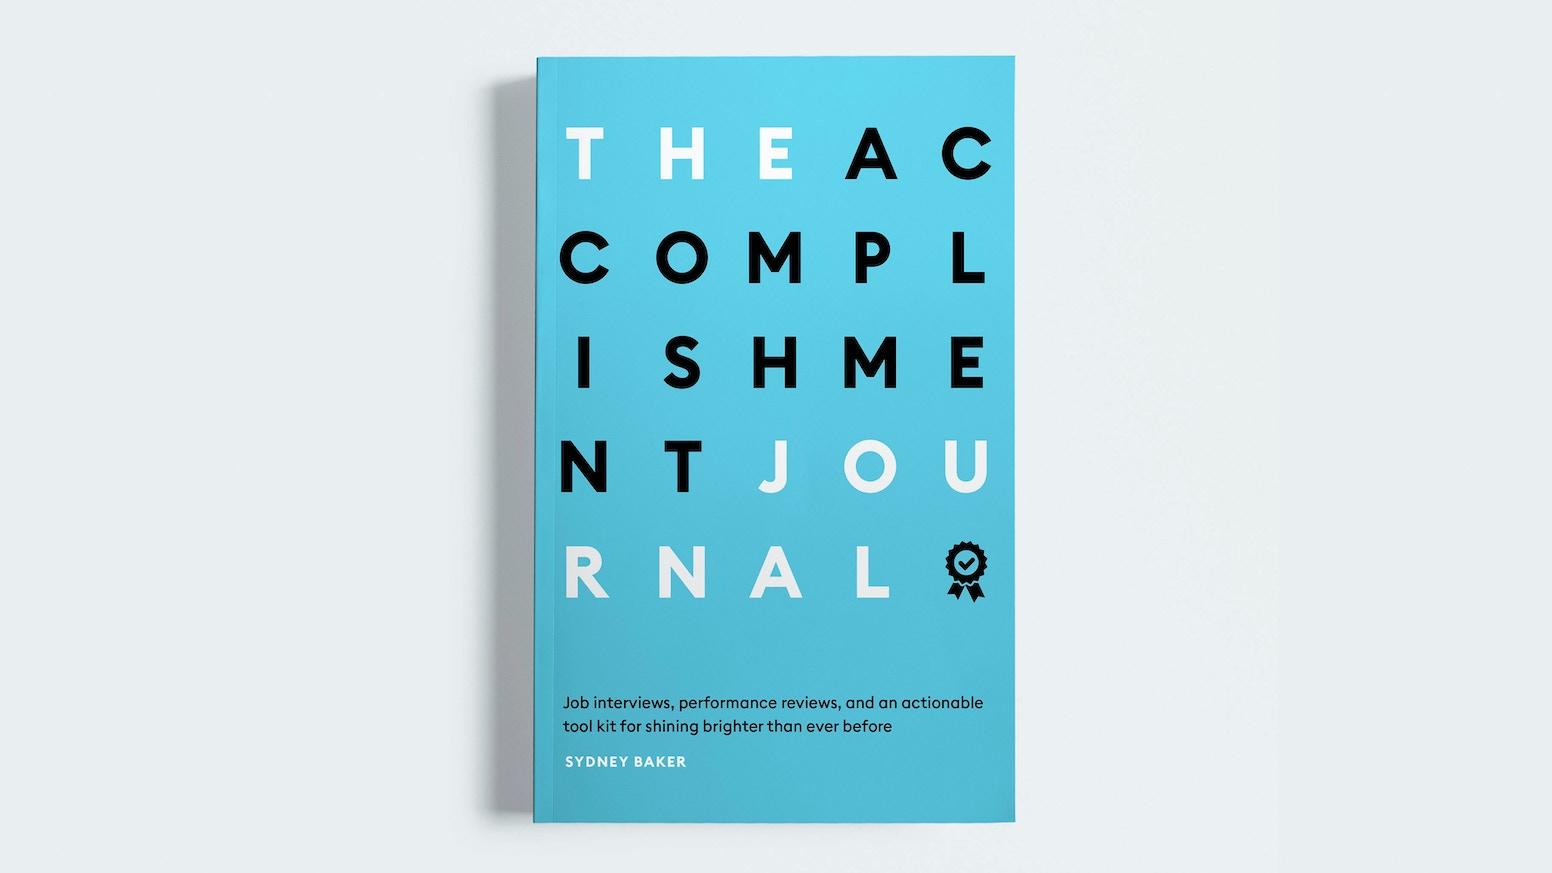 Acomplishment the accomplishment journal: weekly qs for career growth